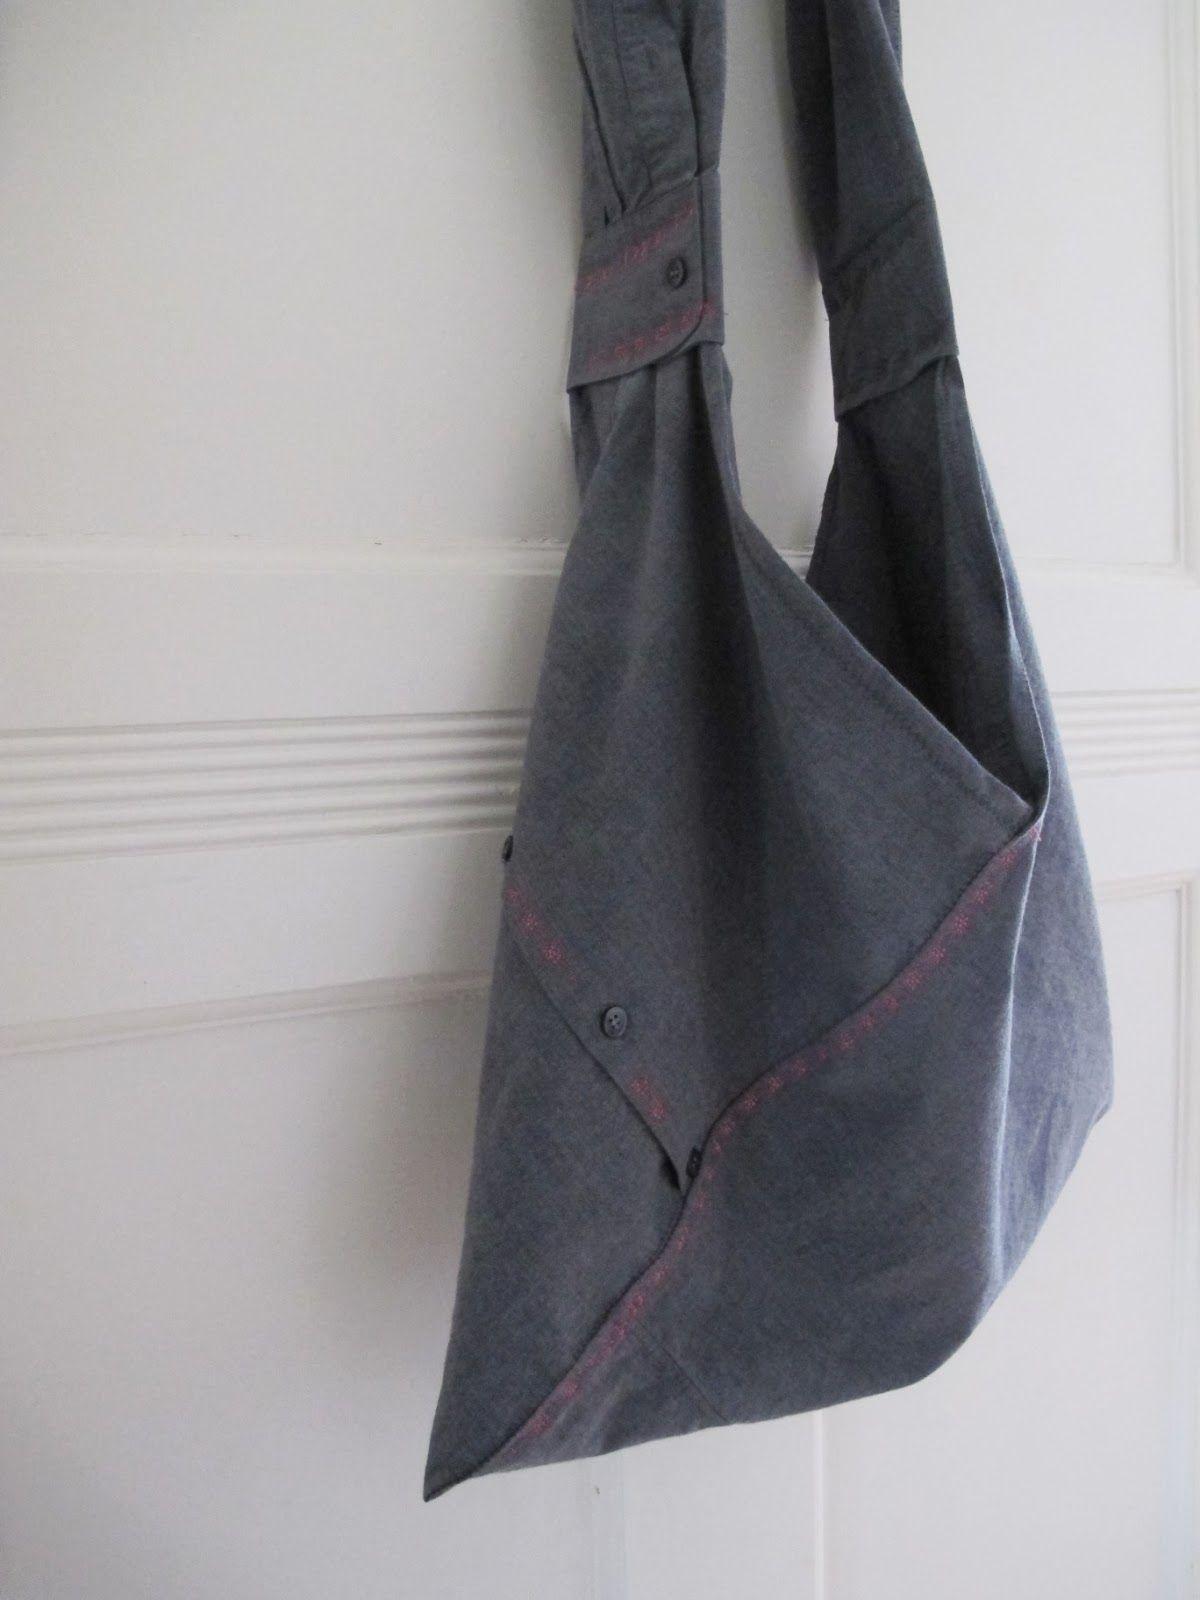 Upcycling - Origami Tasche aus altem Herrenhemd | Upcycling DIY ...